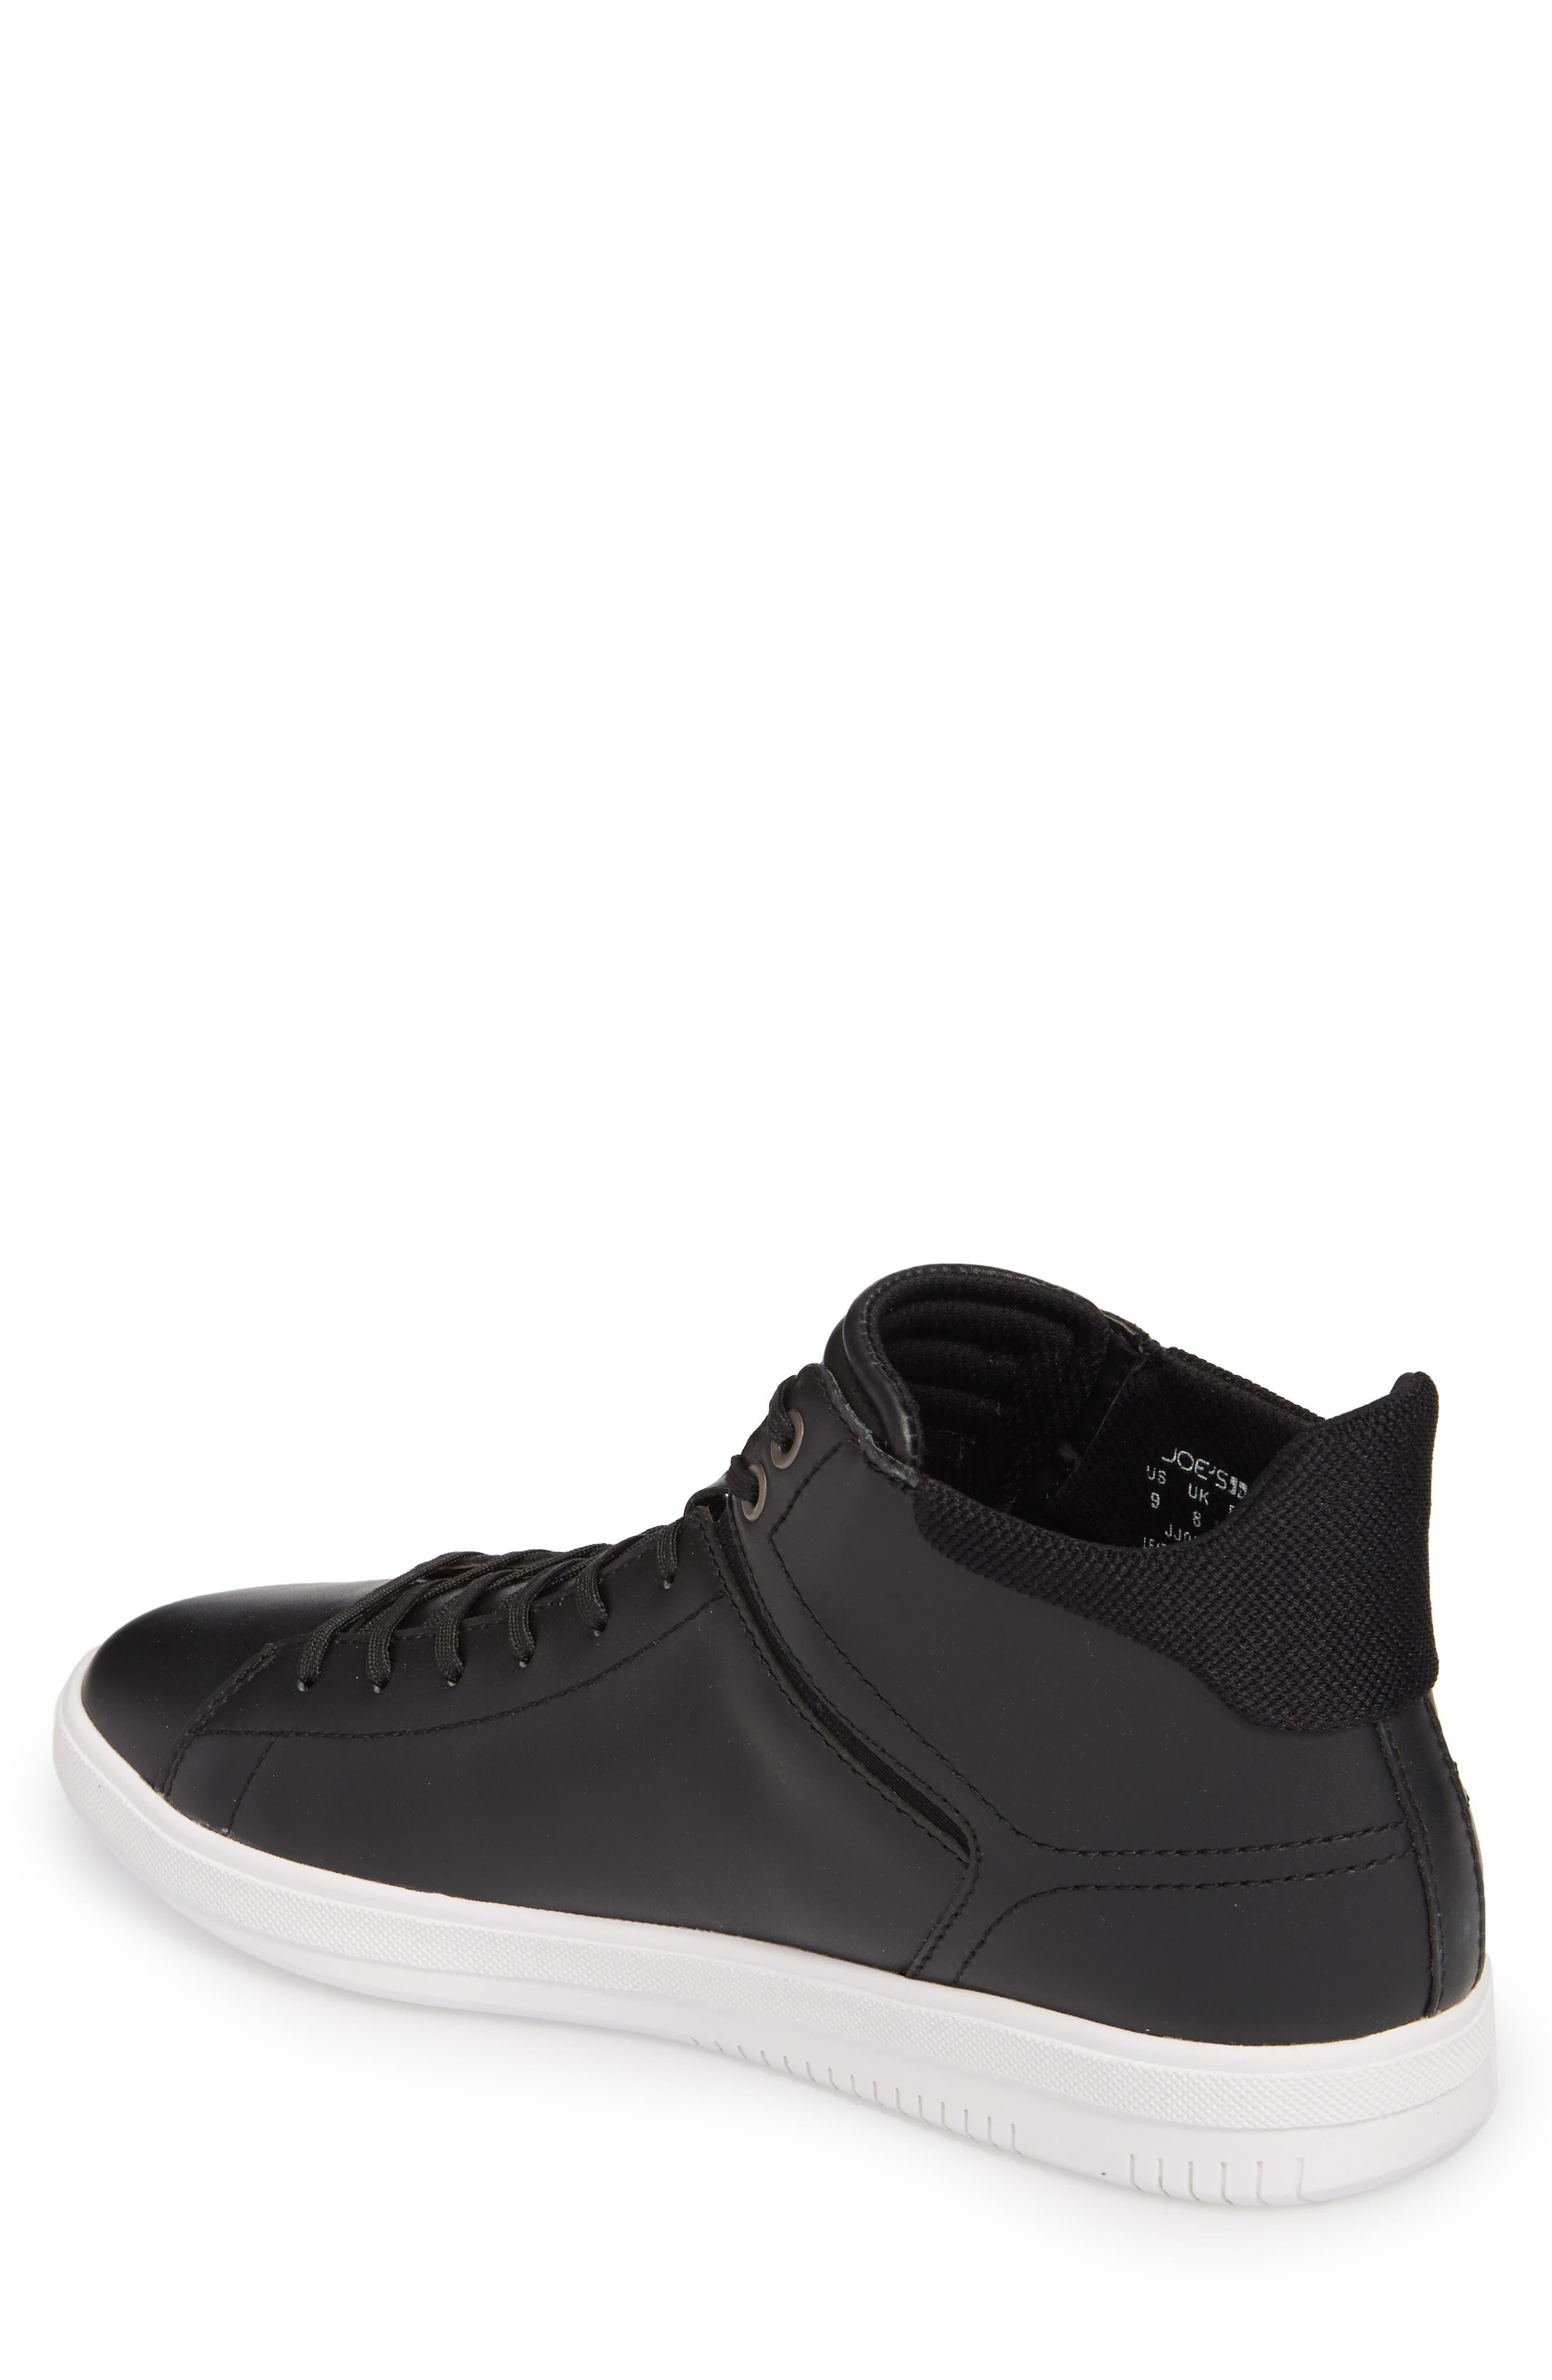 Joe Z Mid Top Sneaker,                             Alternate thumbnail 2, color,                             Black Leather